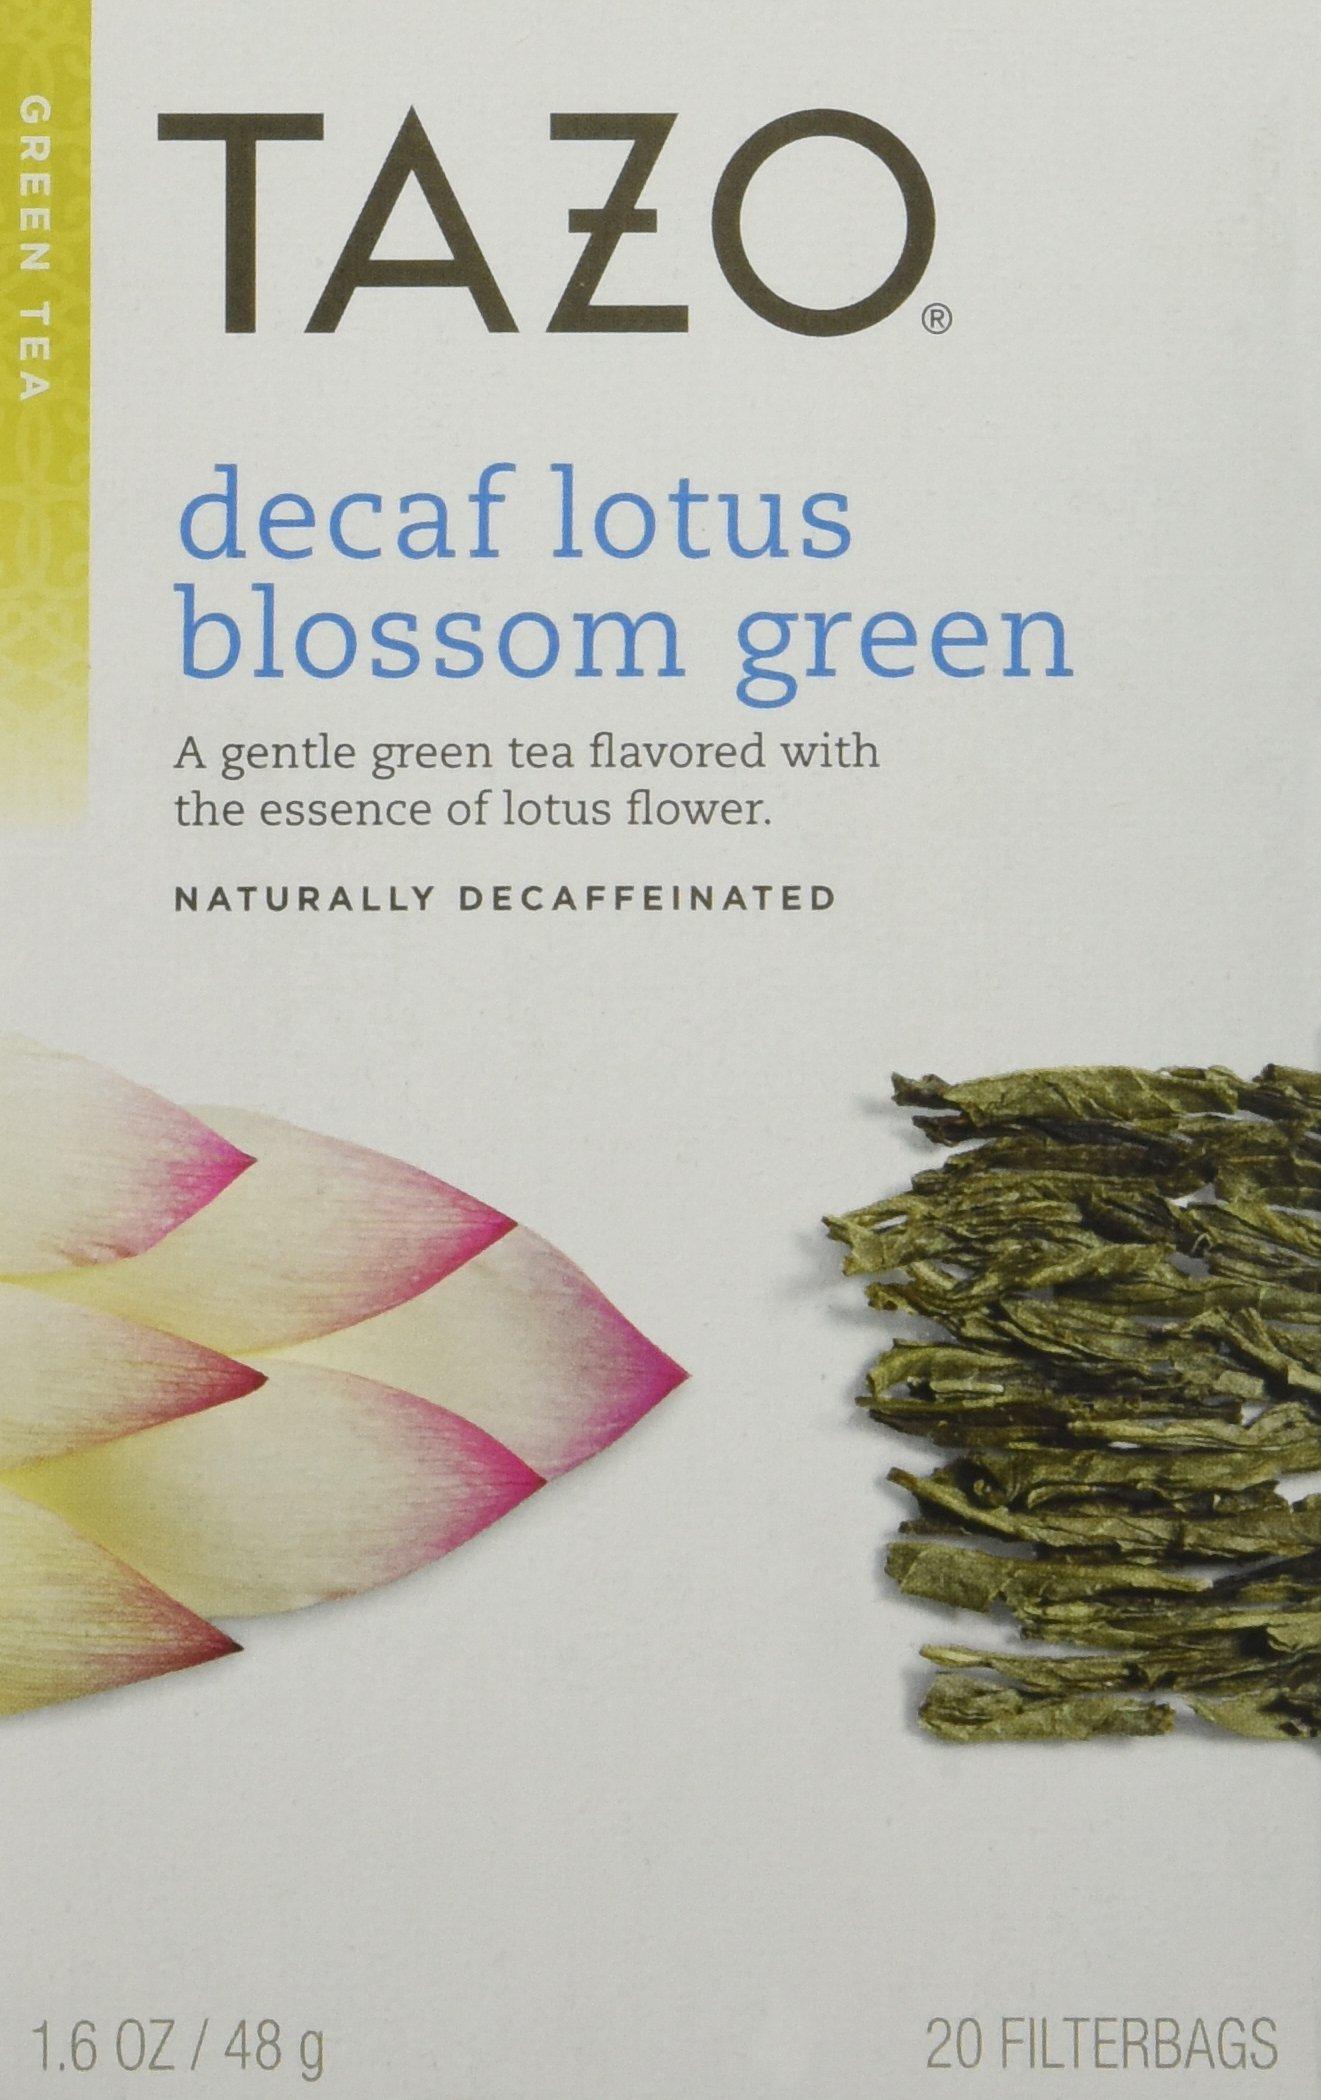 Amazon green tea lotus decaf tazo teas 20 bag health tazo decaf lotus blossom green tea 20 ct izmirmasajfo